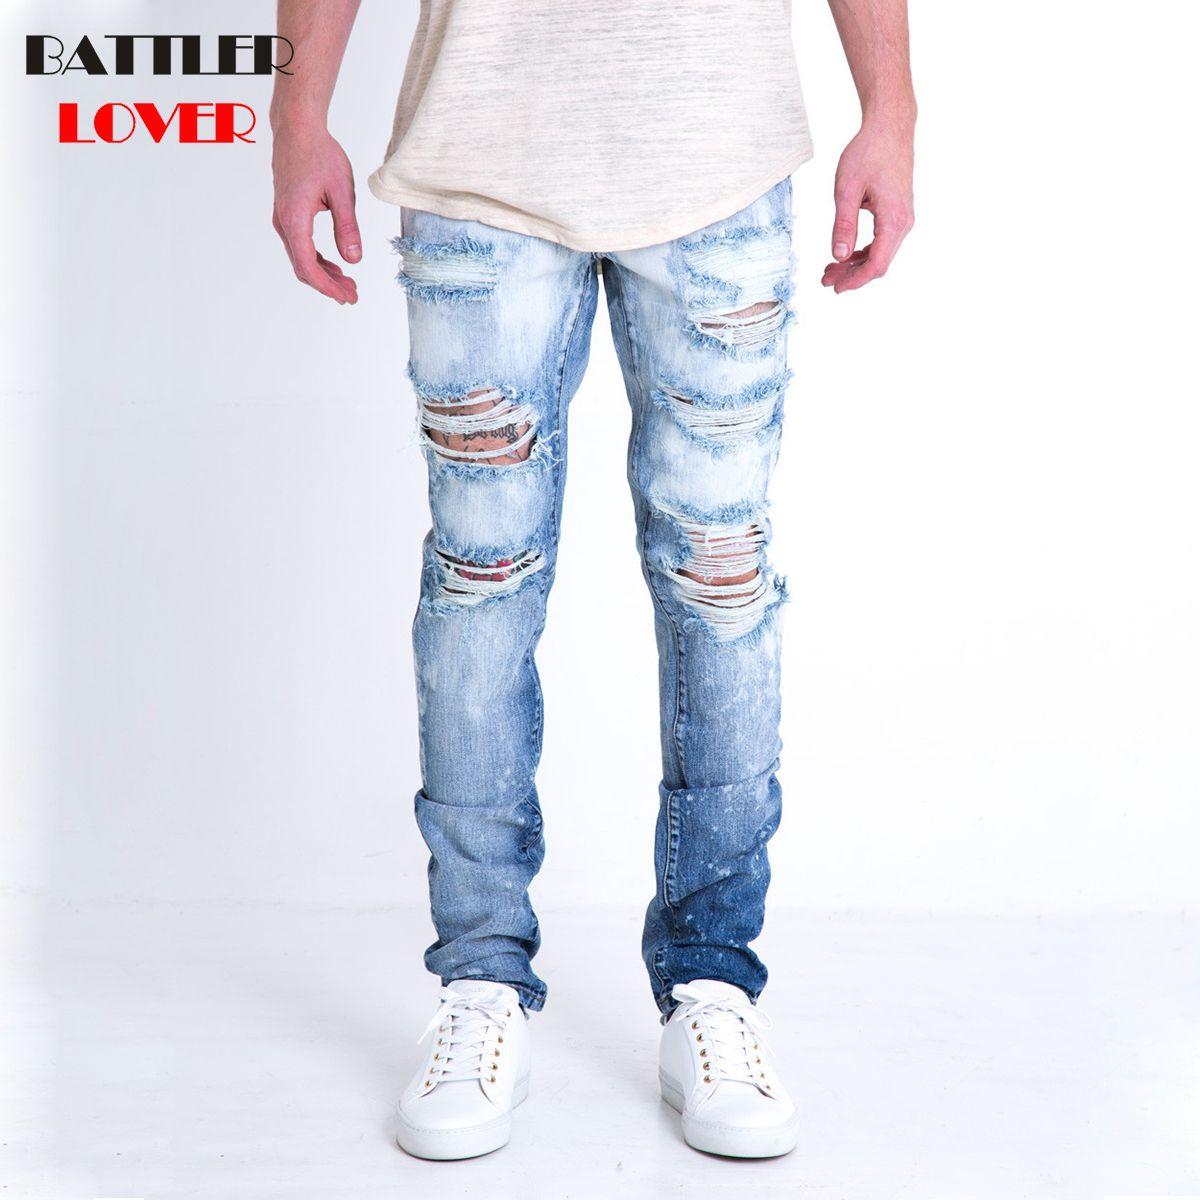 e8c1e0ade10dbd Großhandel Großhandel Motor Jeans Männer Angst Vor Gott Biker Jeans Denim  Hosen Mens Hip Hop Zerrissene Jeans Hose Männlichen Casual Luxusmarke Hosen  Von ...